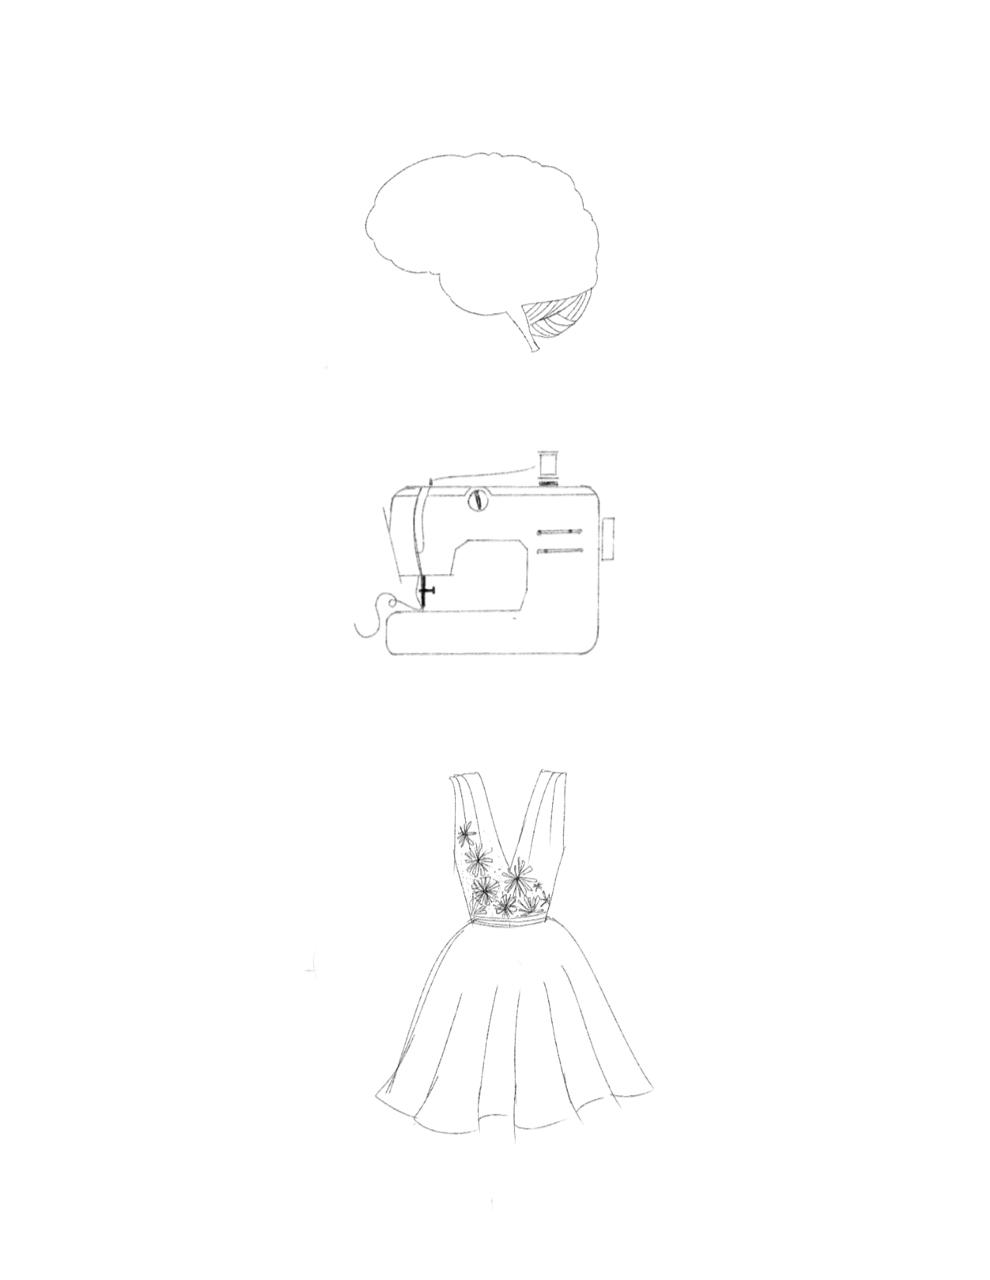 shadalene-design-janome-sketch-2.jpg